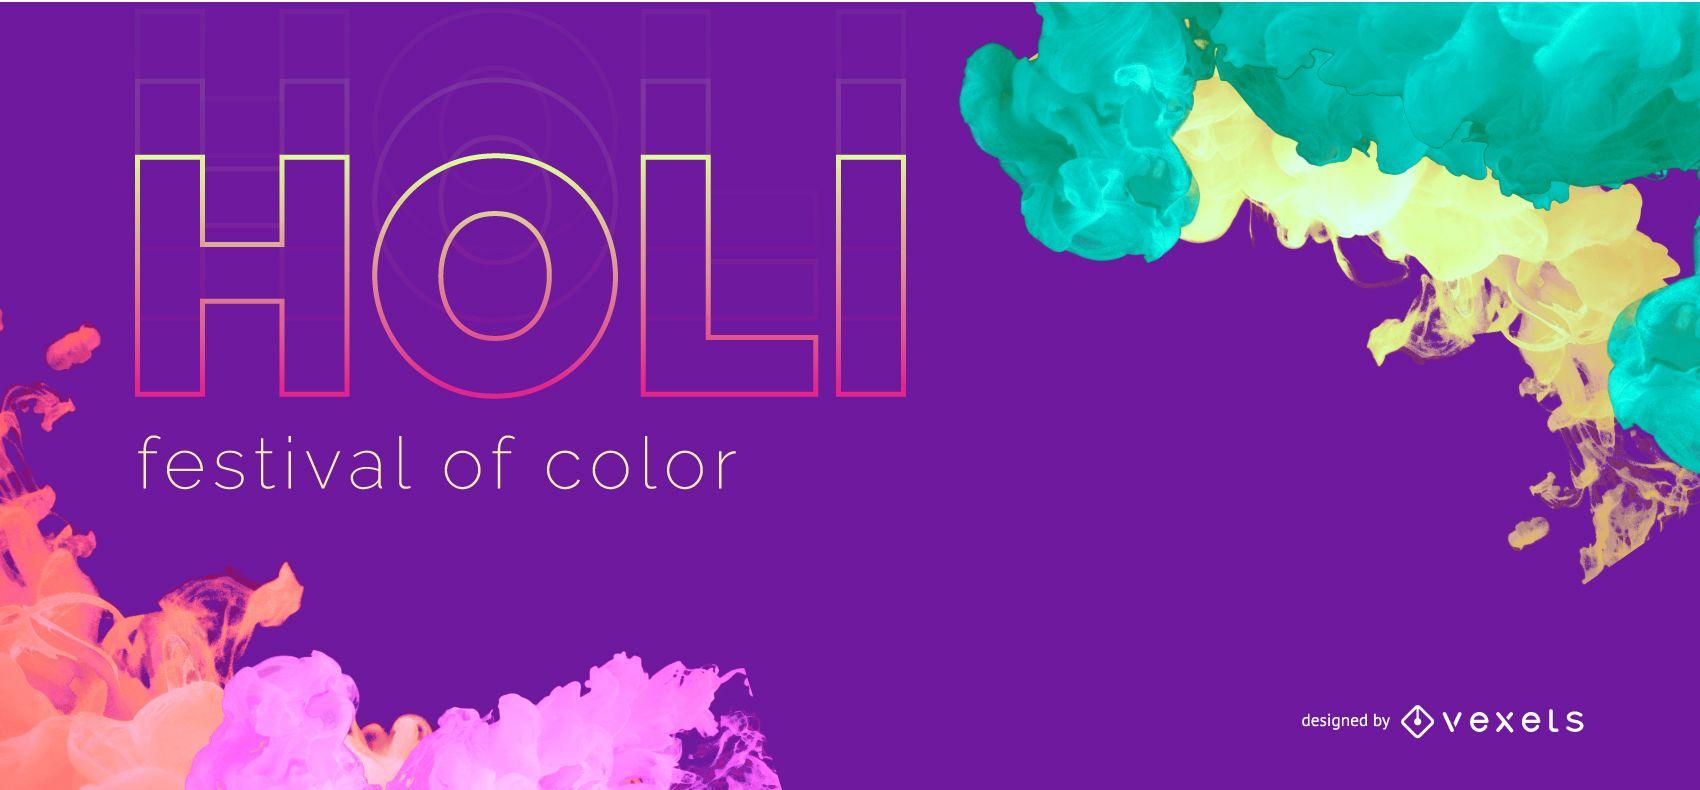 Holi Festival Colorful Web Banner Design